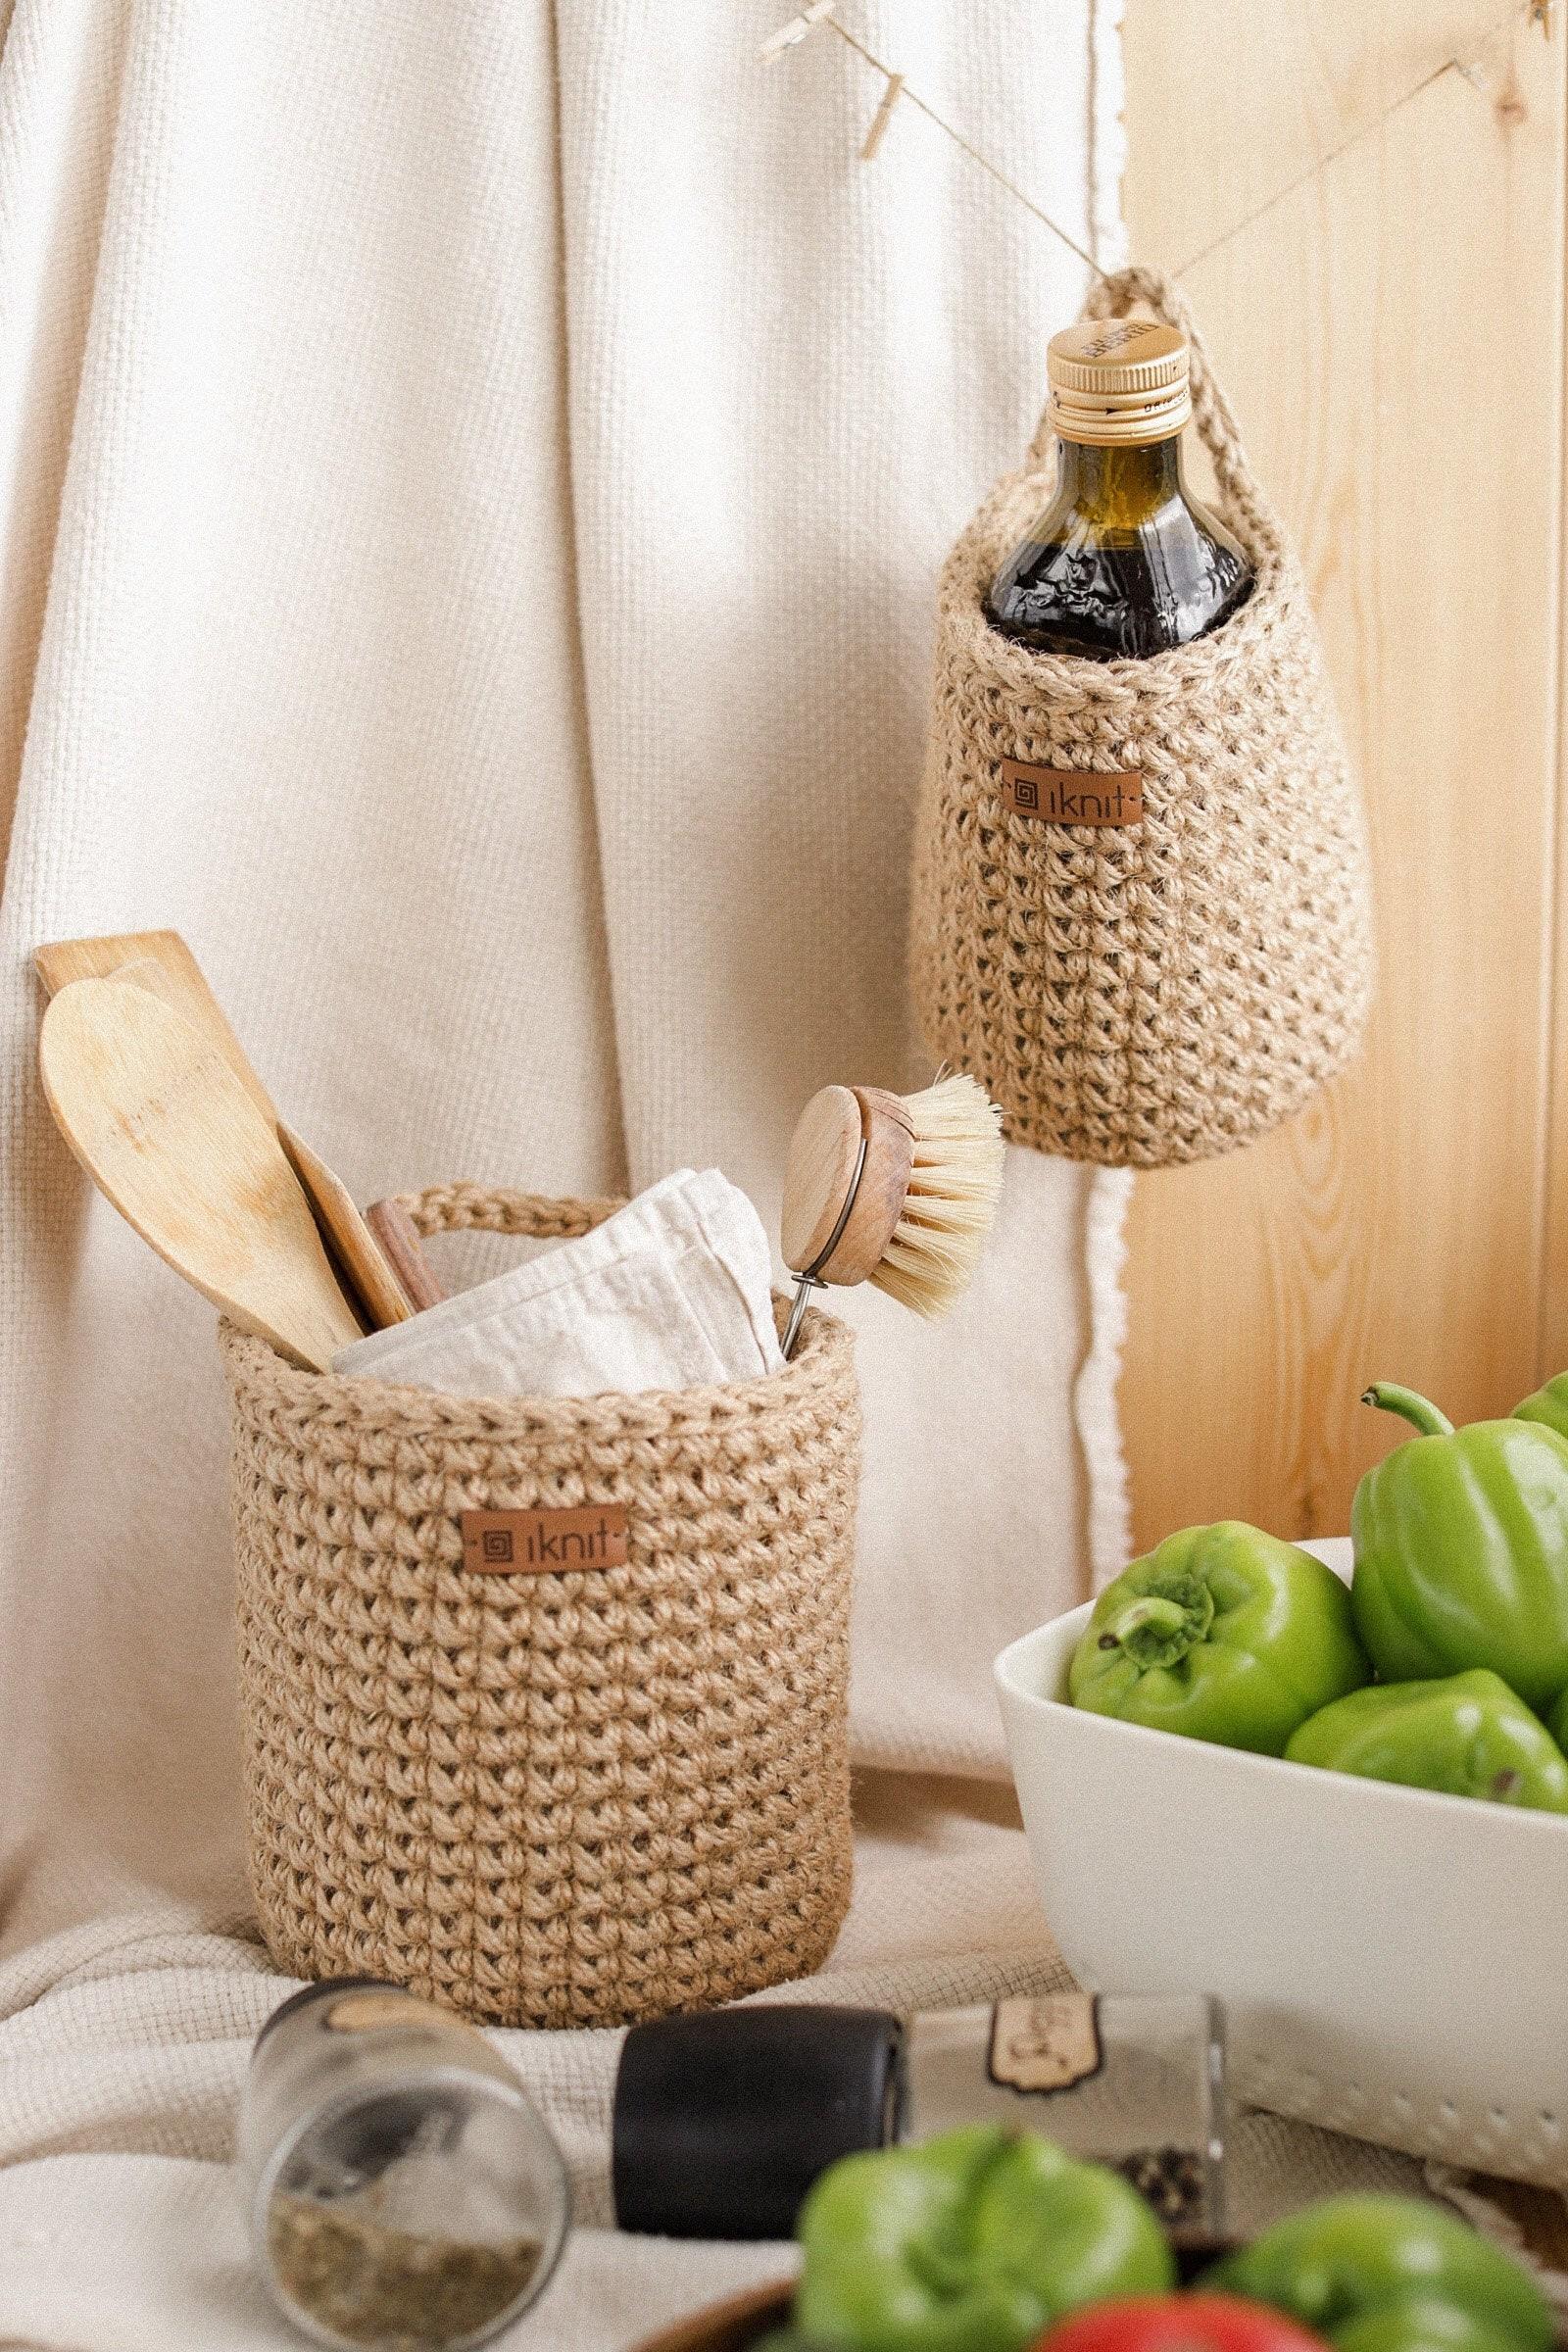 Set of two baskets | Wall hanging baskets | Storage baskets | Jute baskets